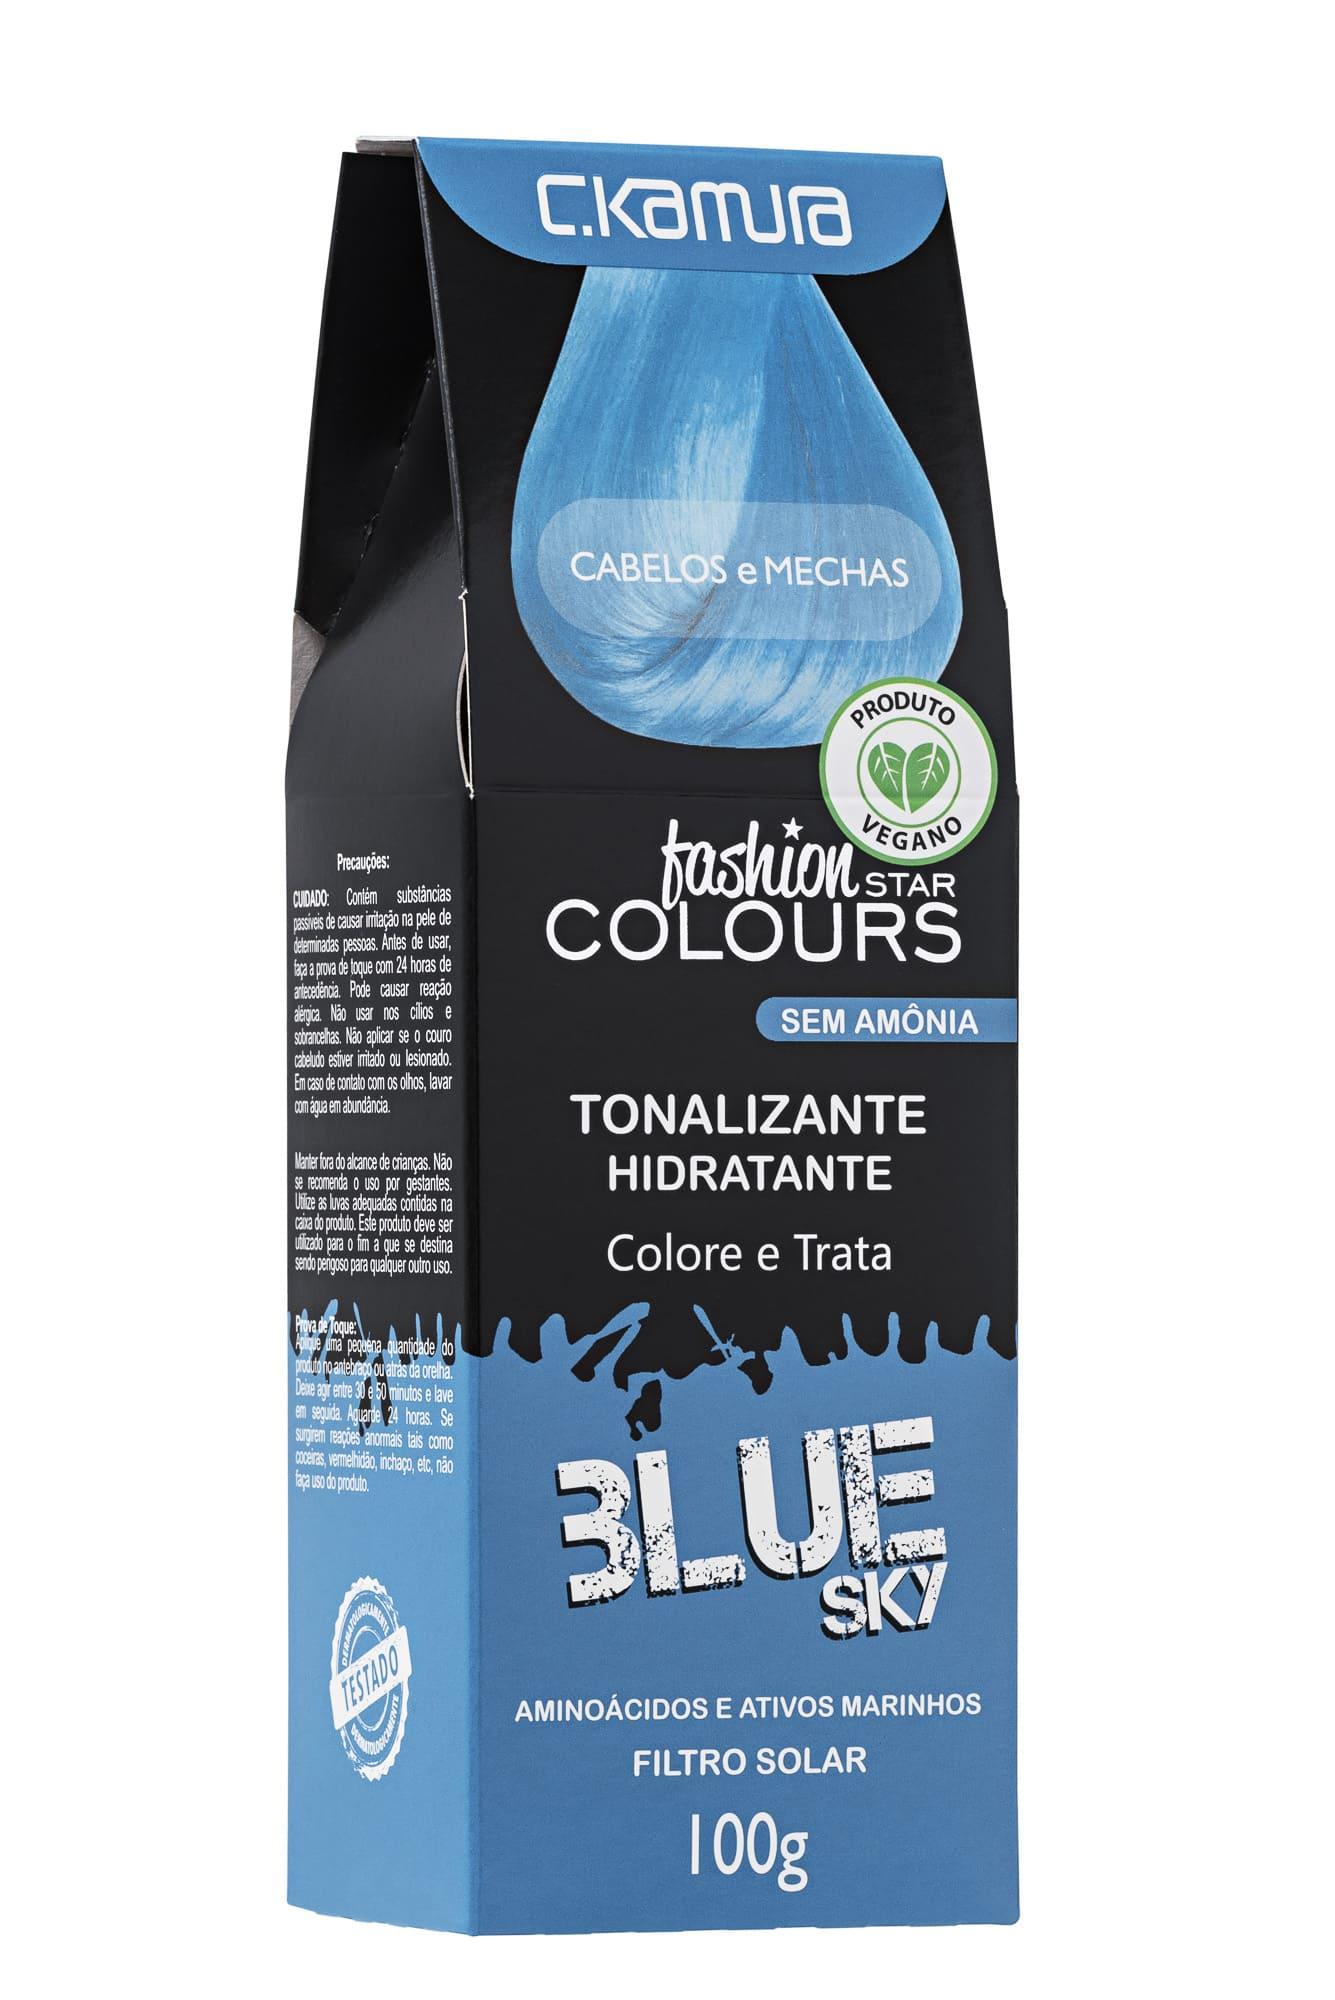 Tonalizante Blue Sky Azul Claro Fashion Star Colours  Ckamura